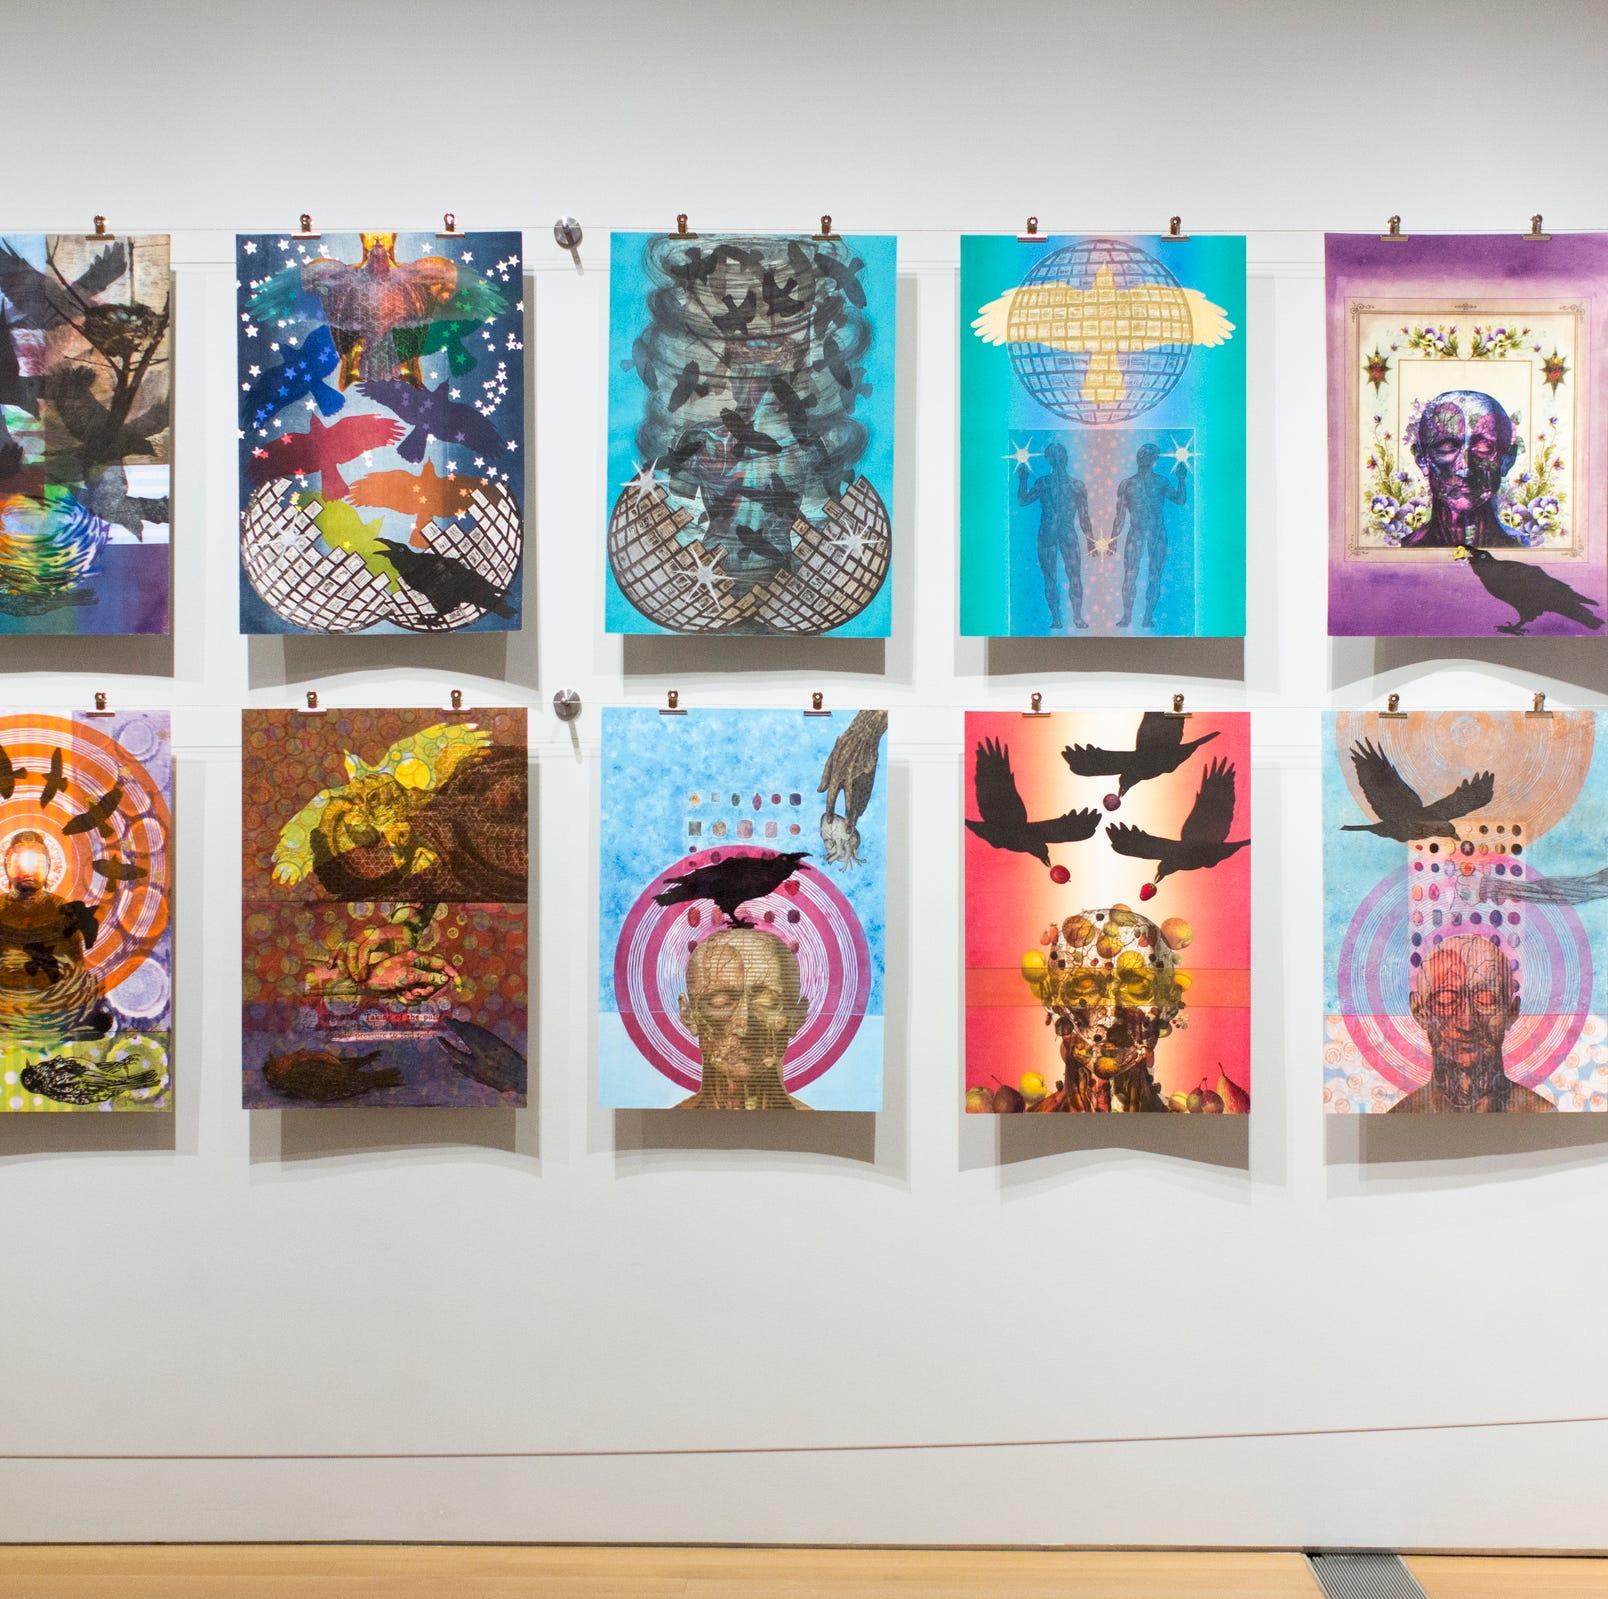 ArtPrize 2018: Detroit-area artists shine at Grand Rapids competition